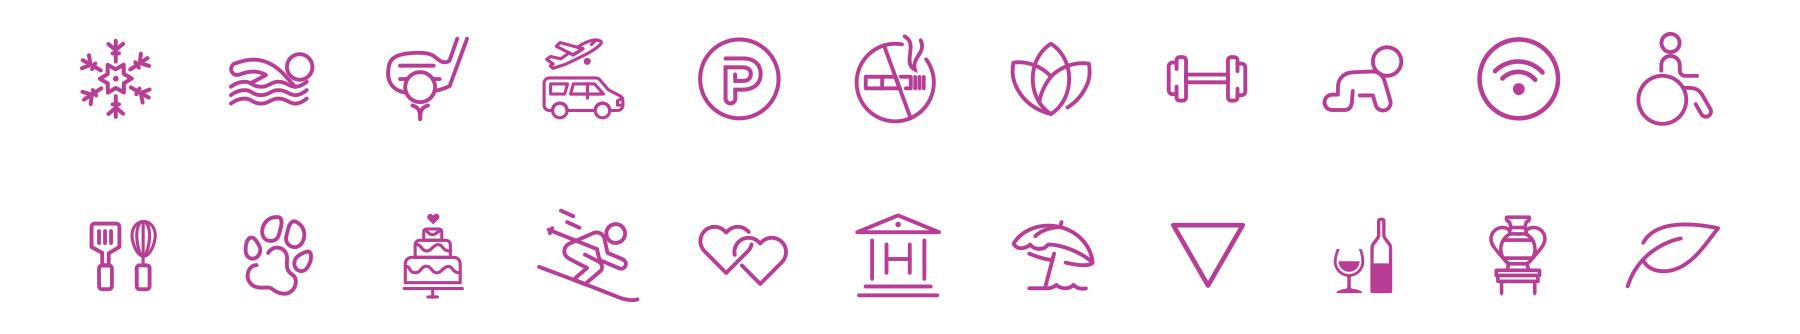 PHG-Icons2.jpg